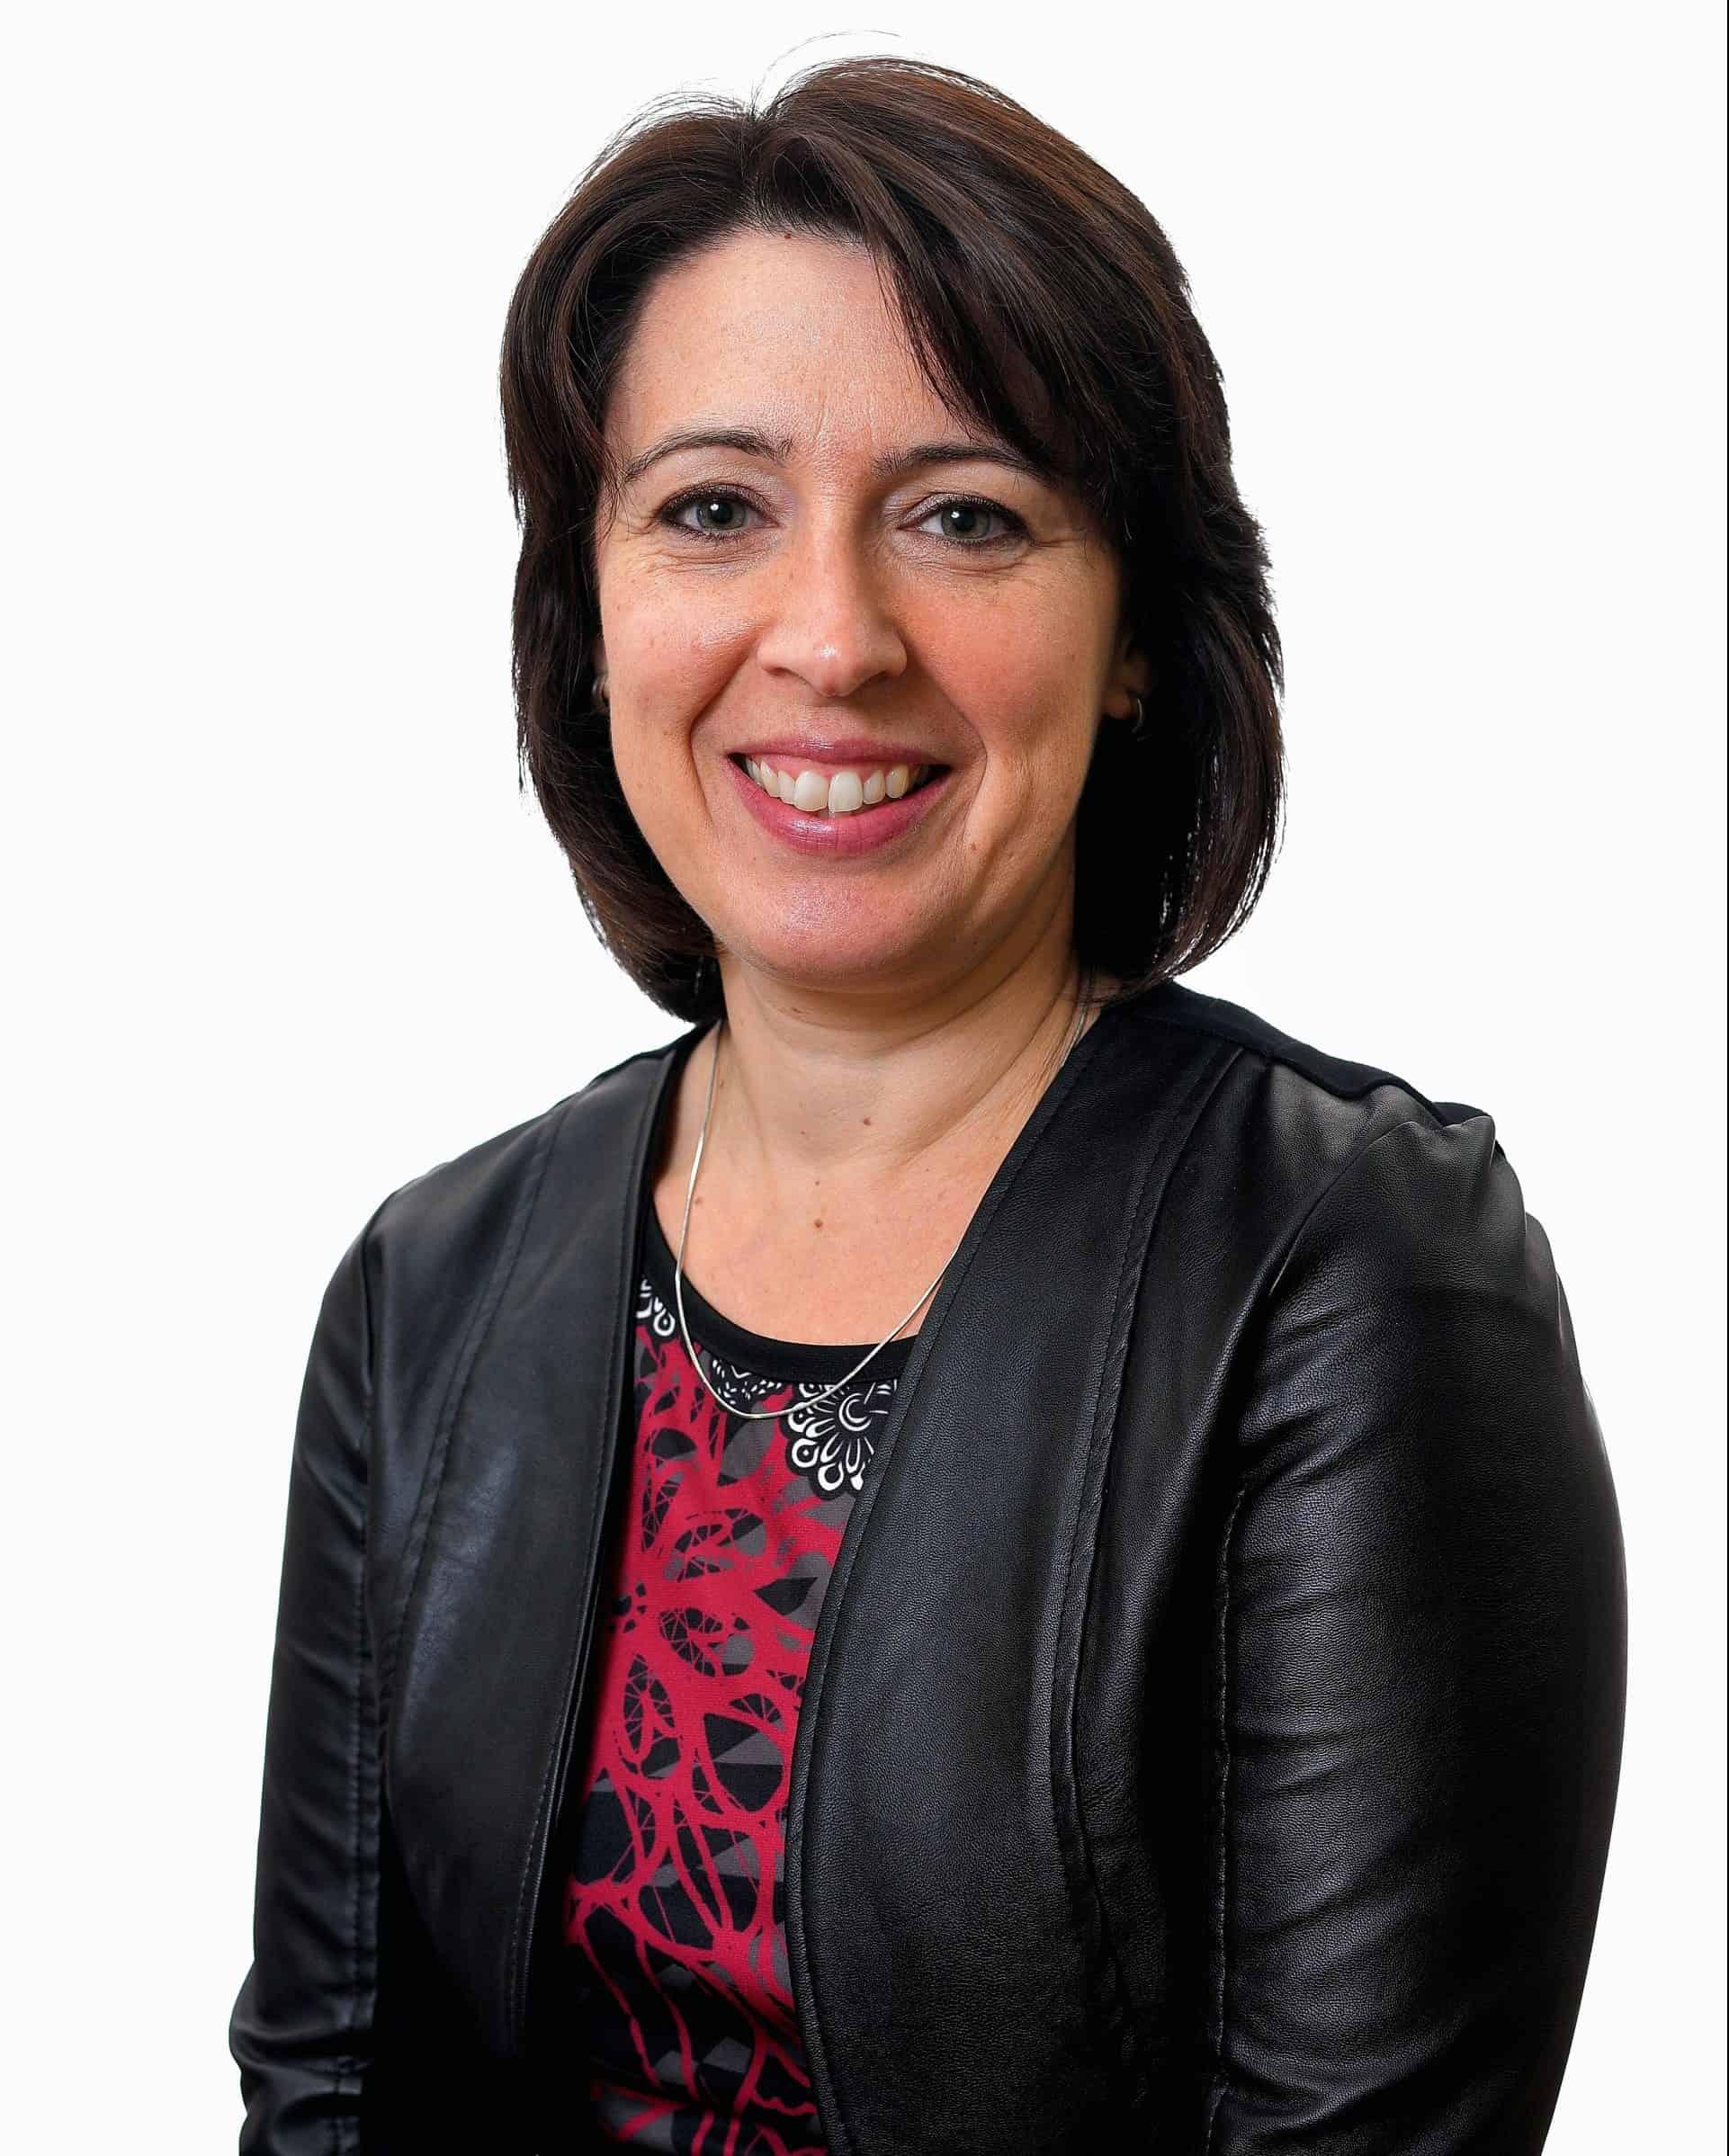 Isabelle Chouinard, Conseillère, siège 2